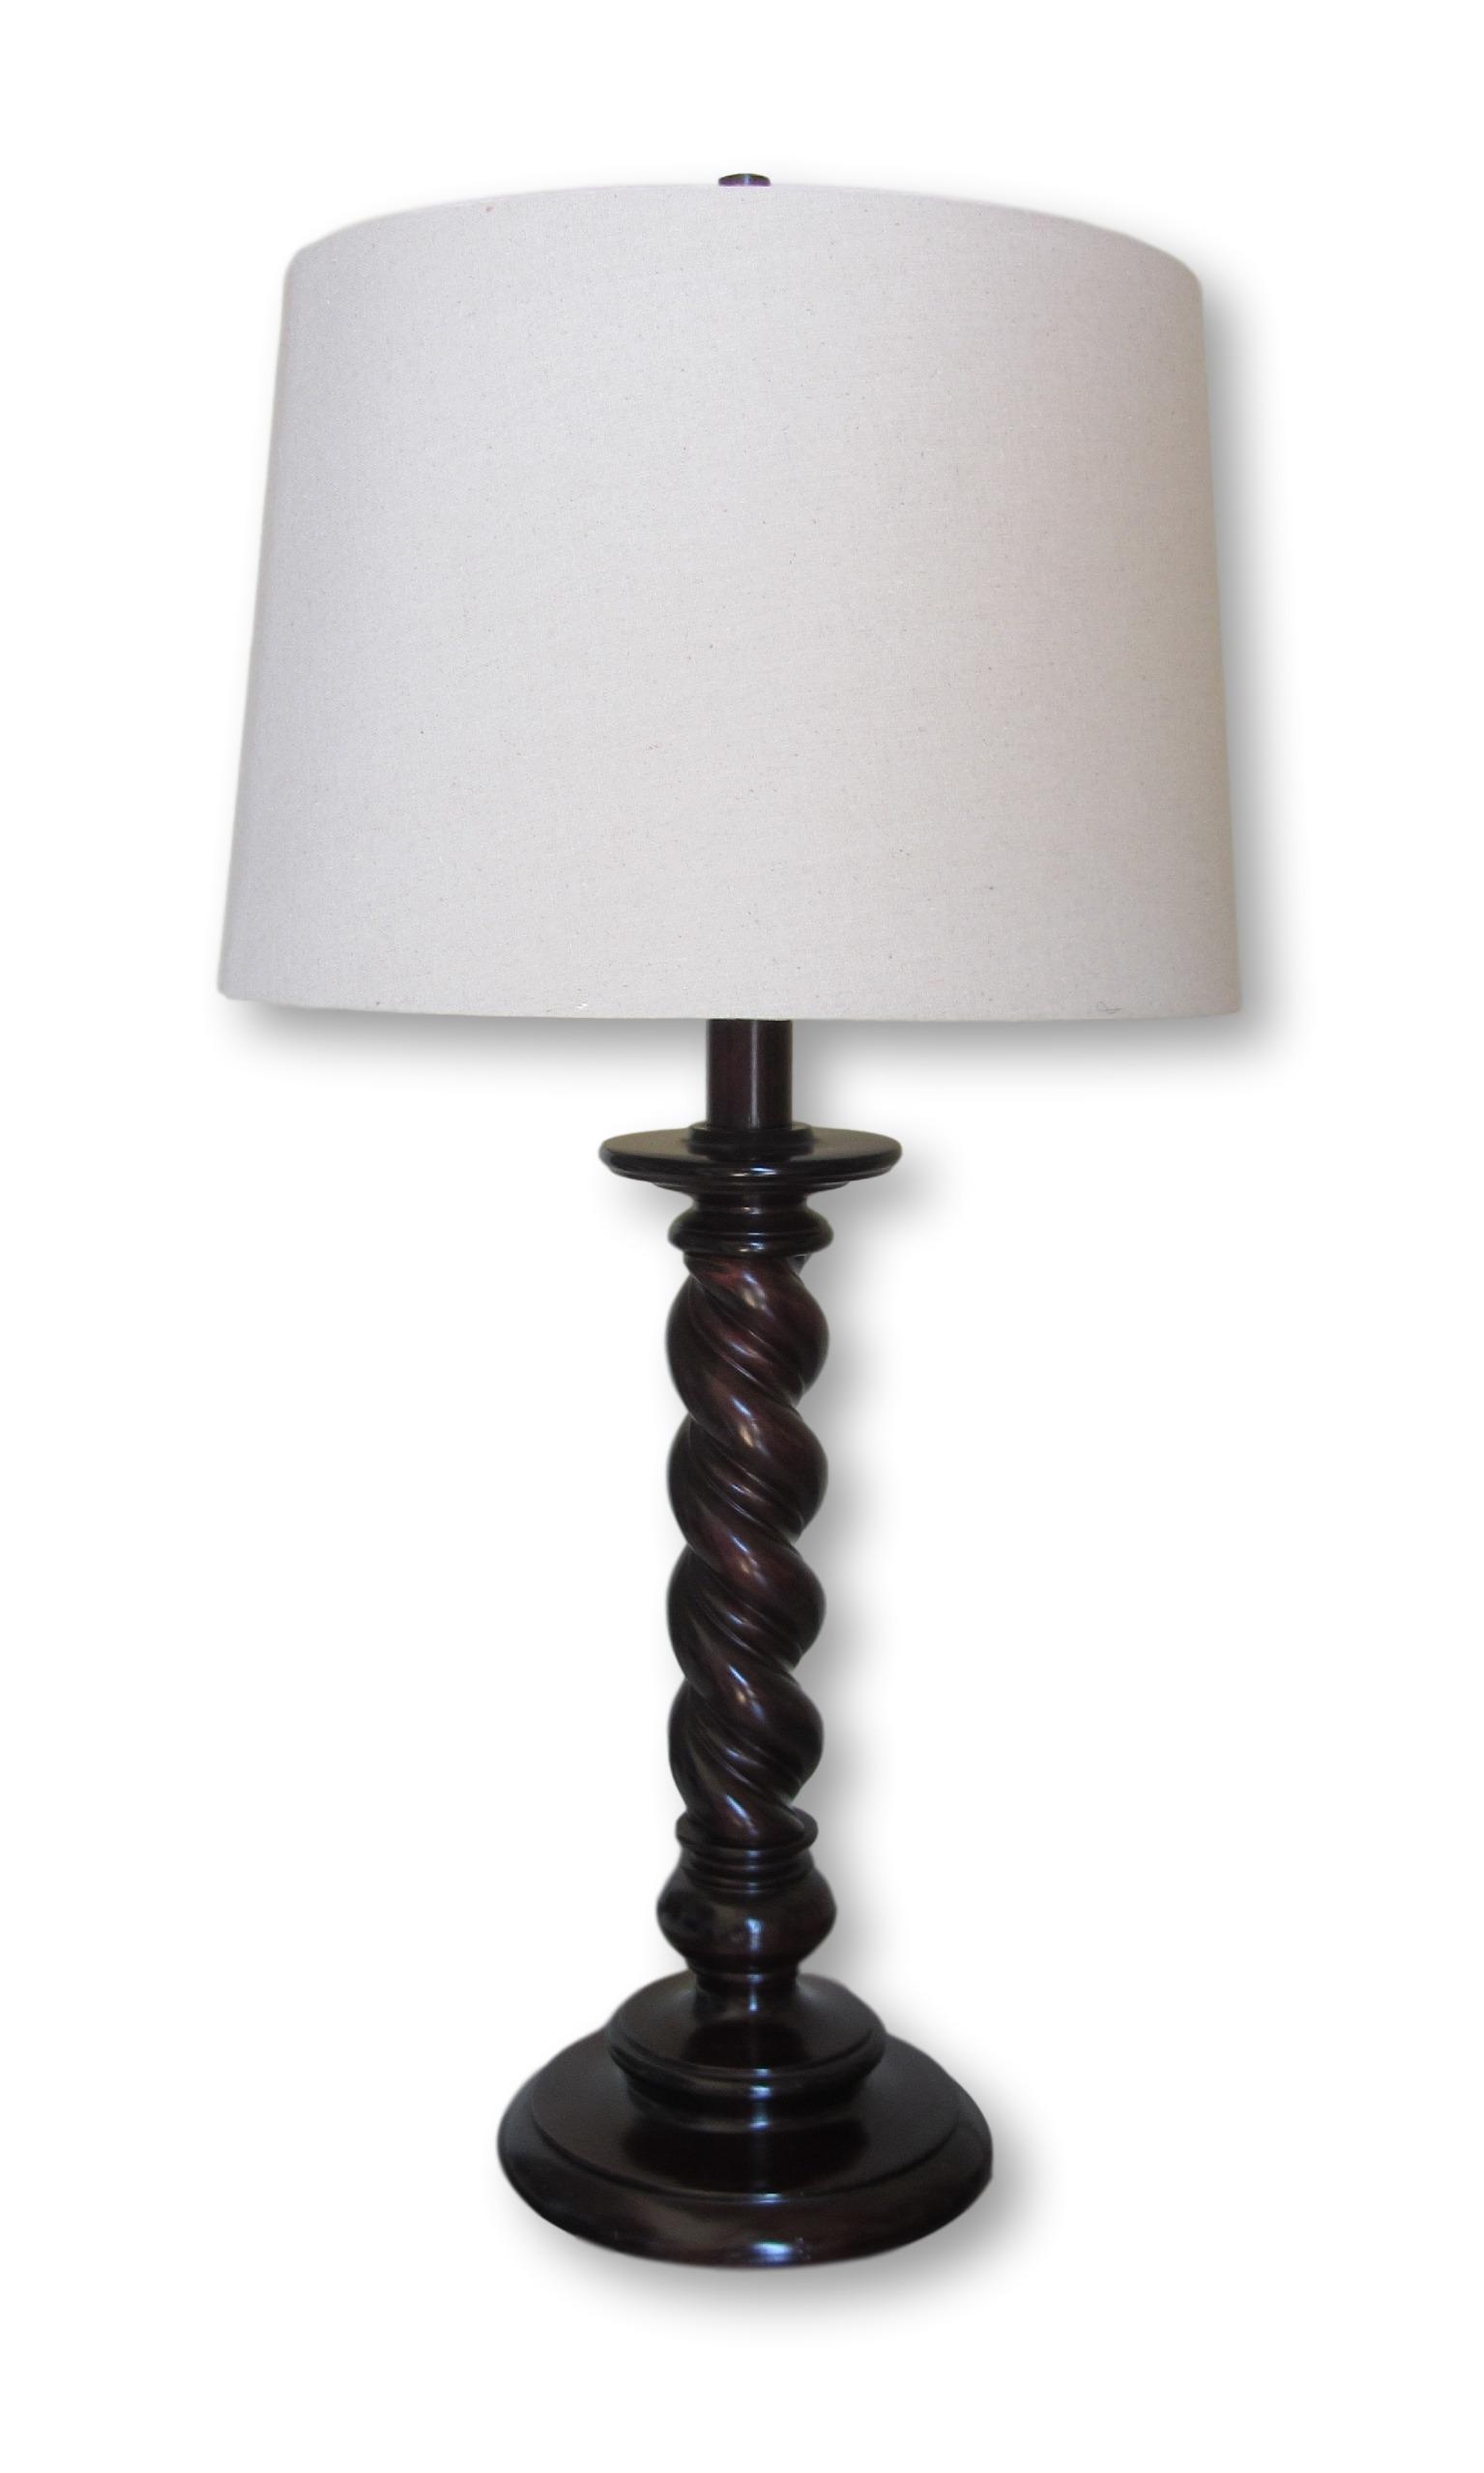 Restoration Hardware Barley Twist Table Lamp